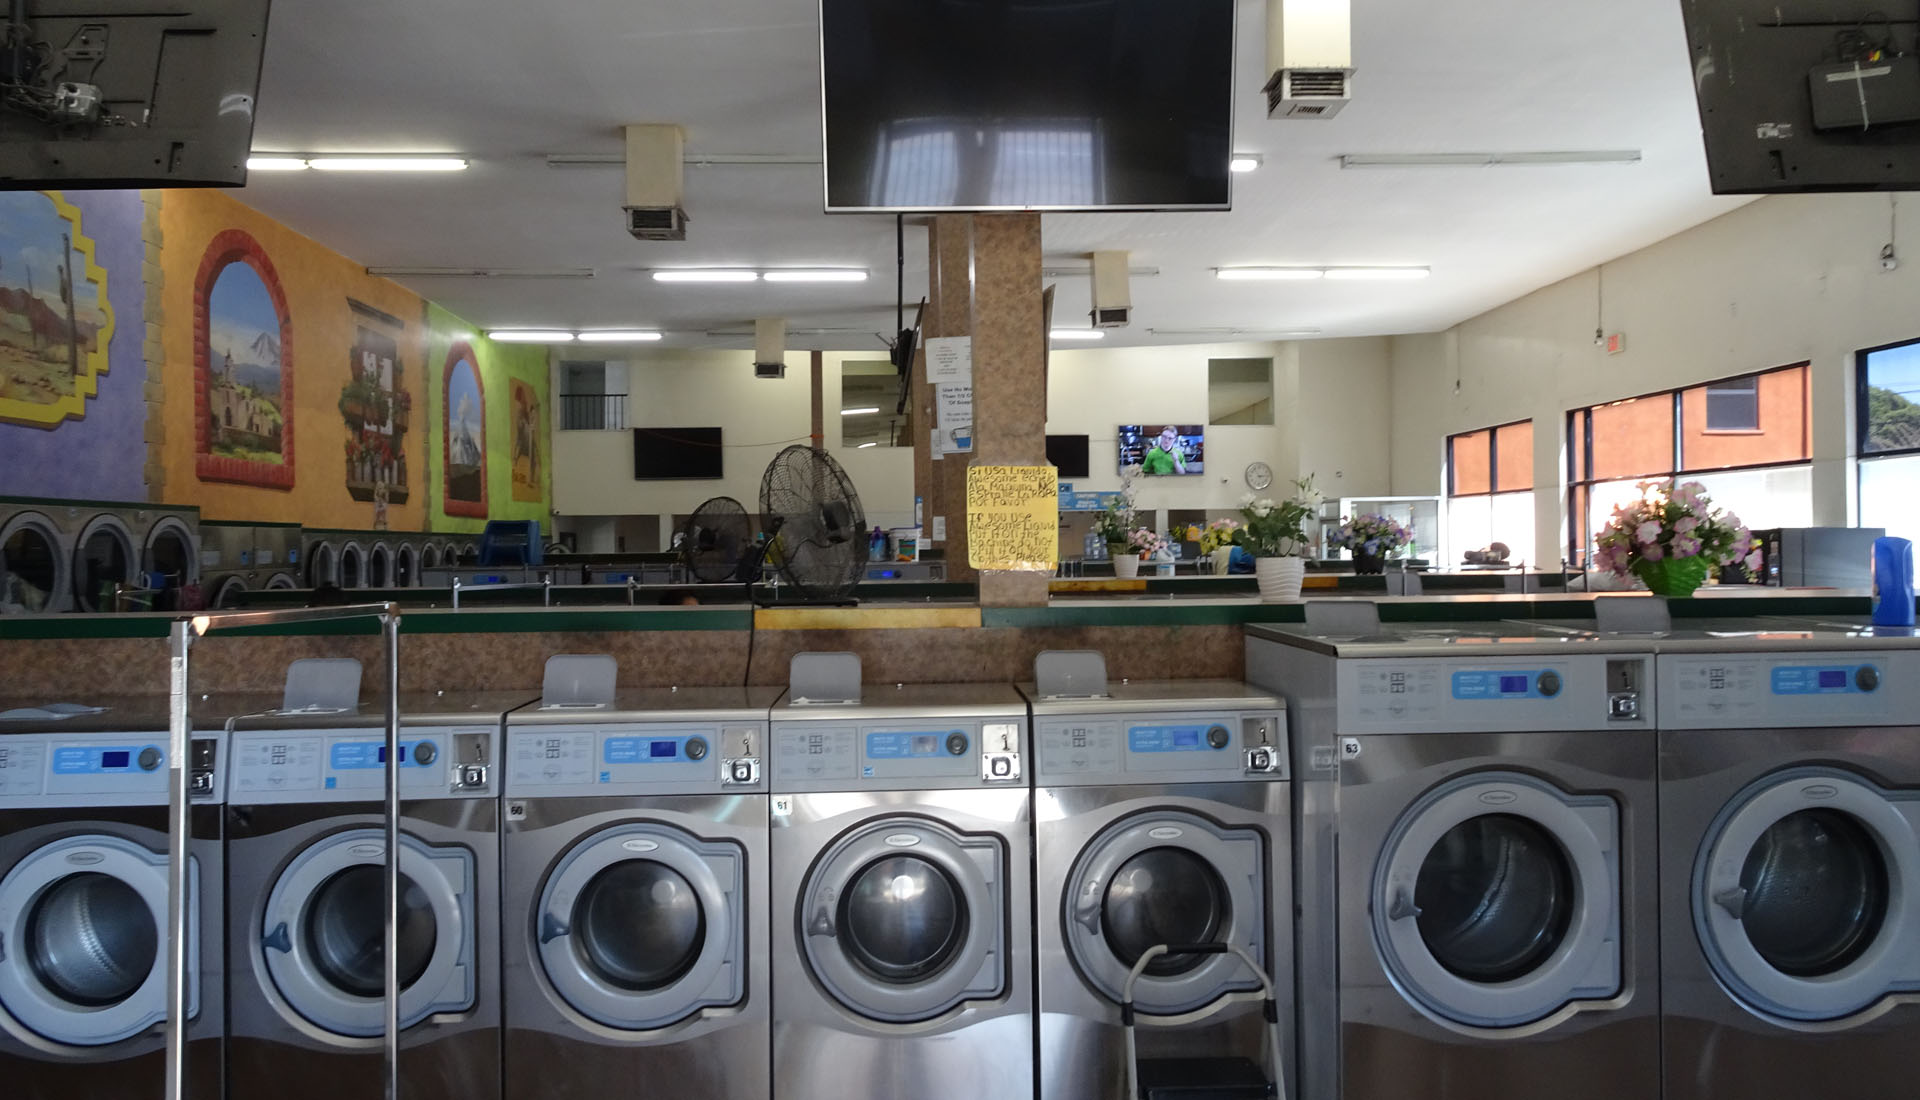 Ehem Kirche heute Coin Laundry